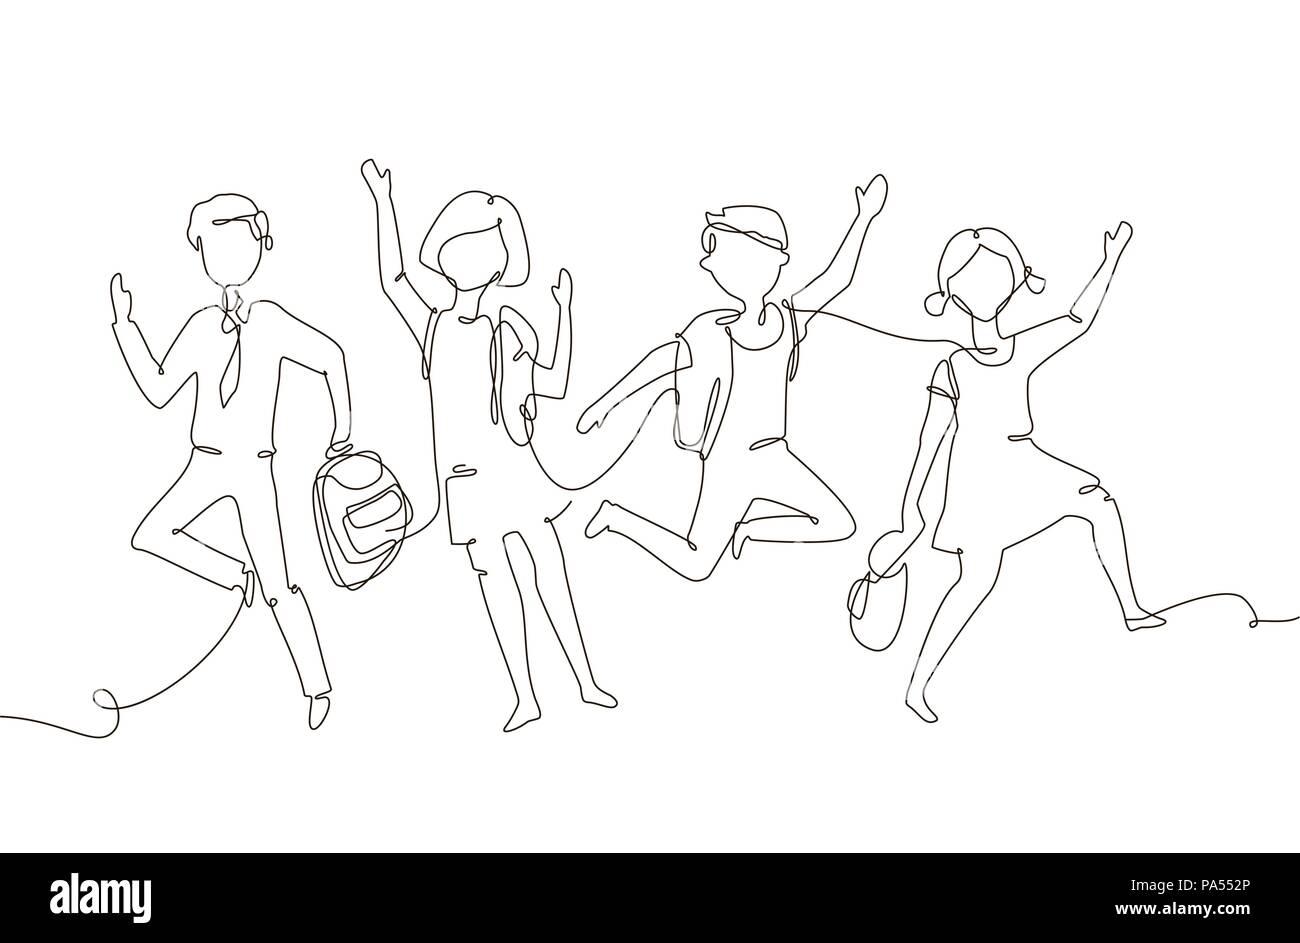 Happy schoolchildren - one line design style illustration - Stock Vector